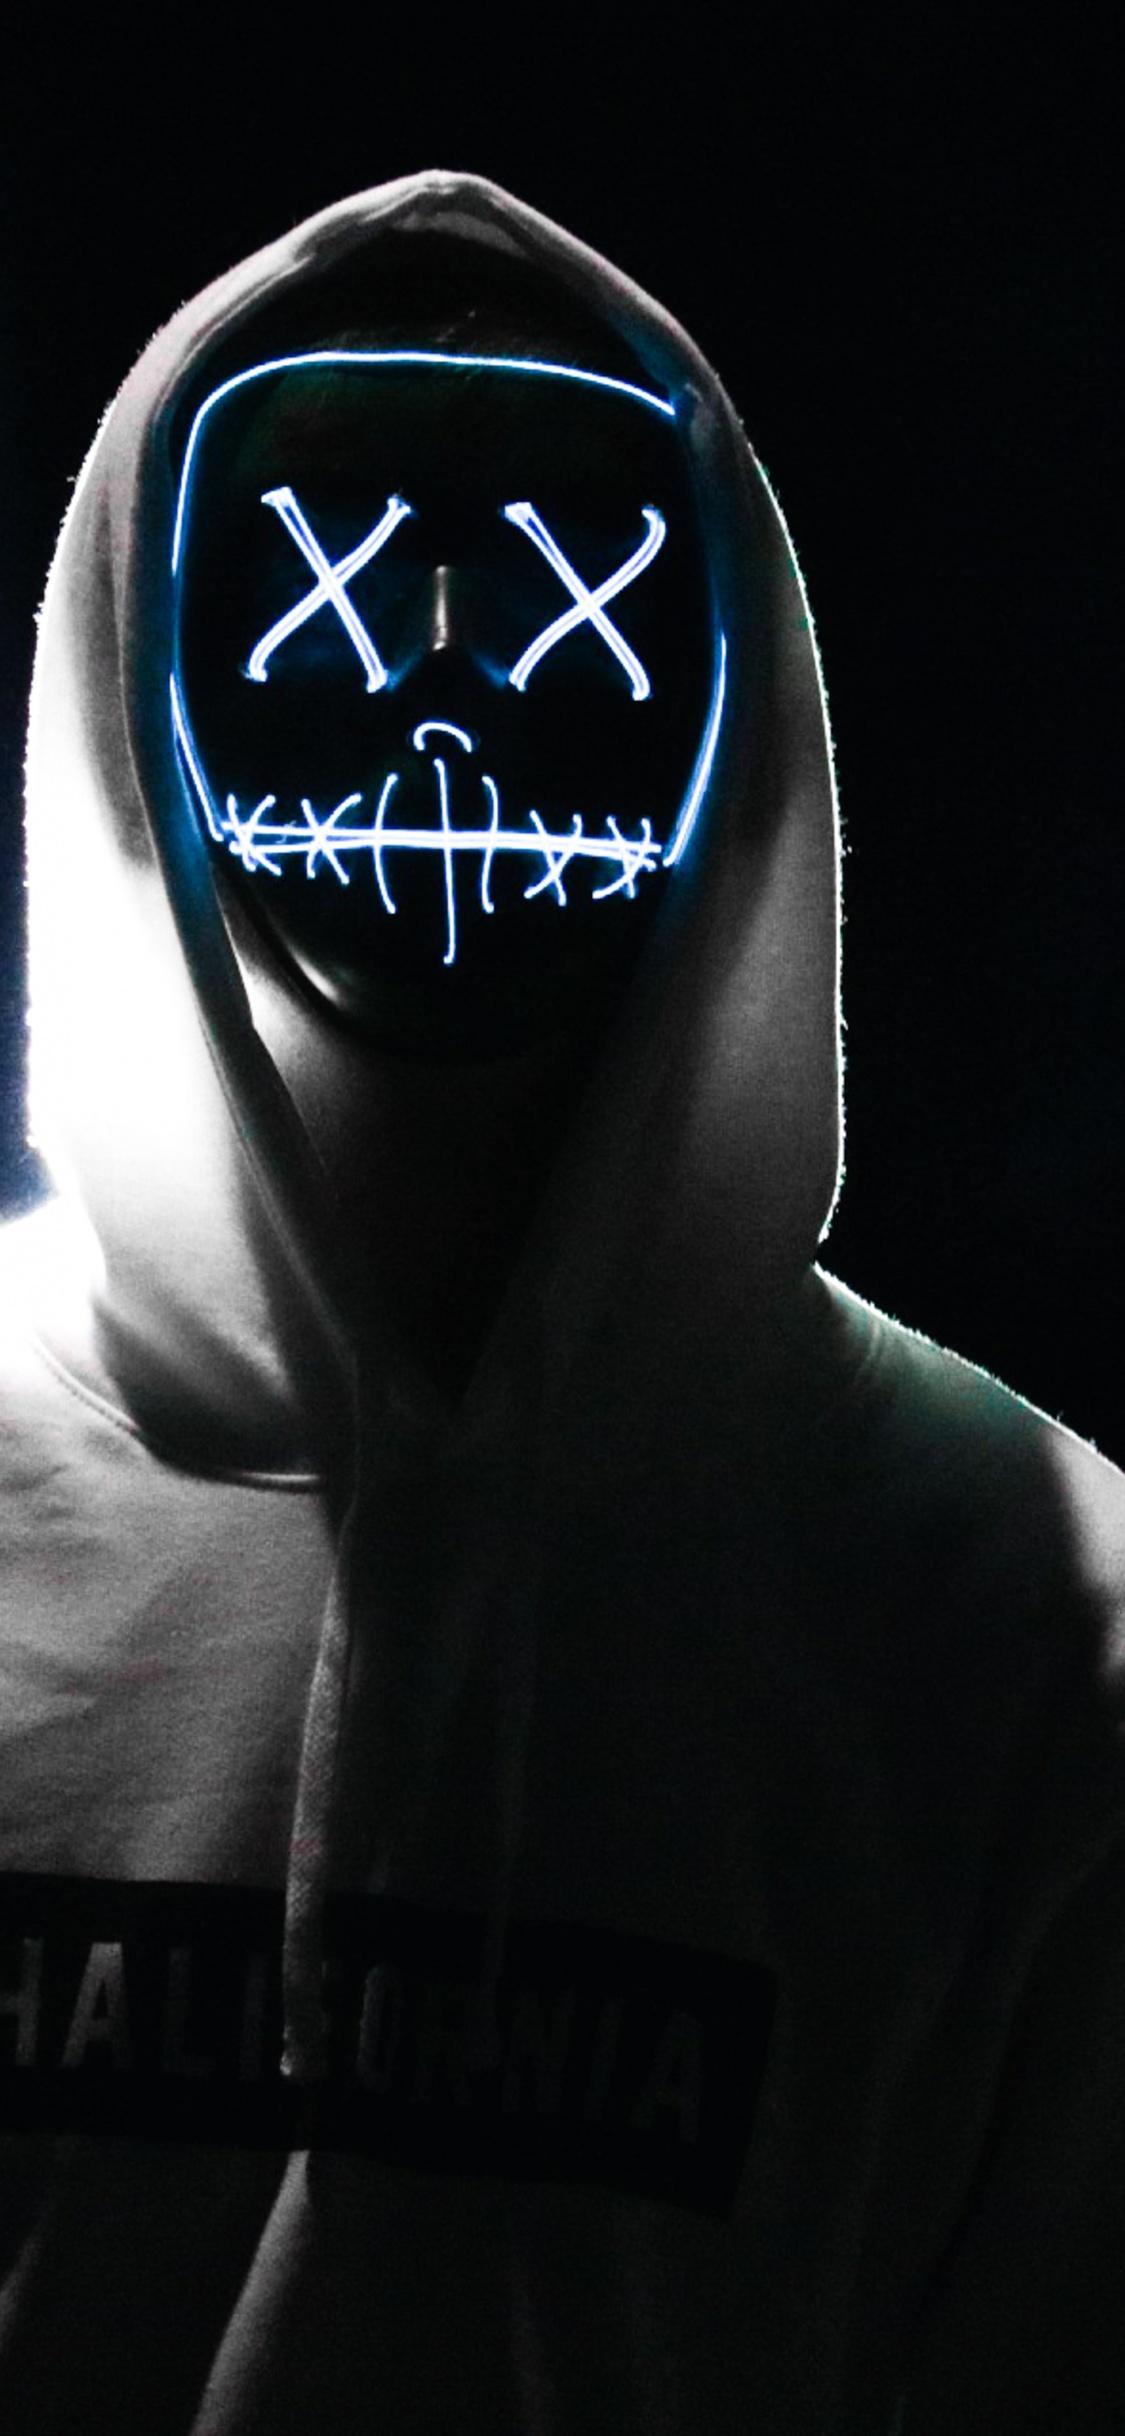 Man 4k Wallpaper Led Mask Dope Night Anonymous Hoodie Amoled Black Background 5k Photography 132